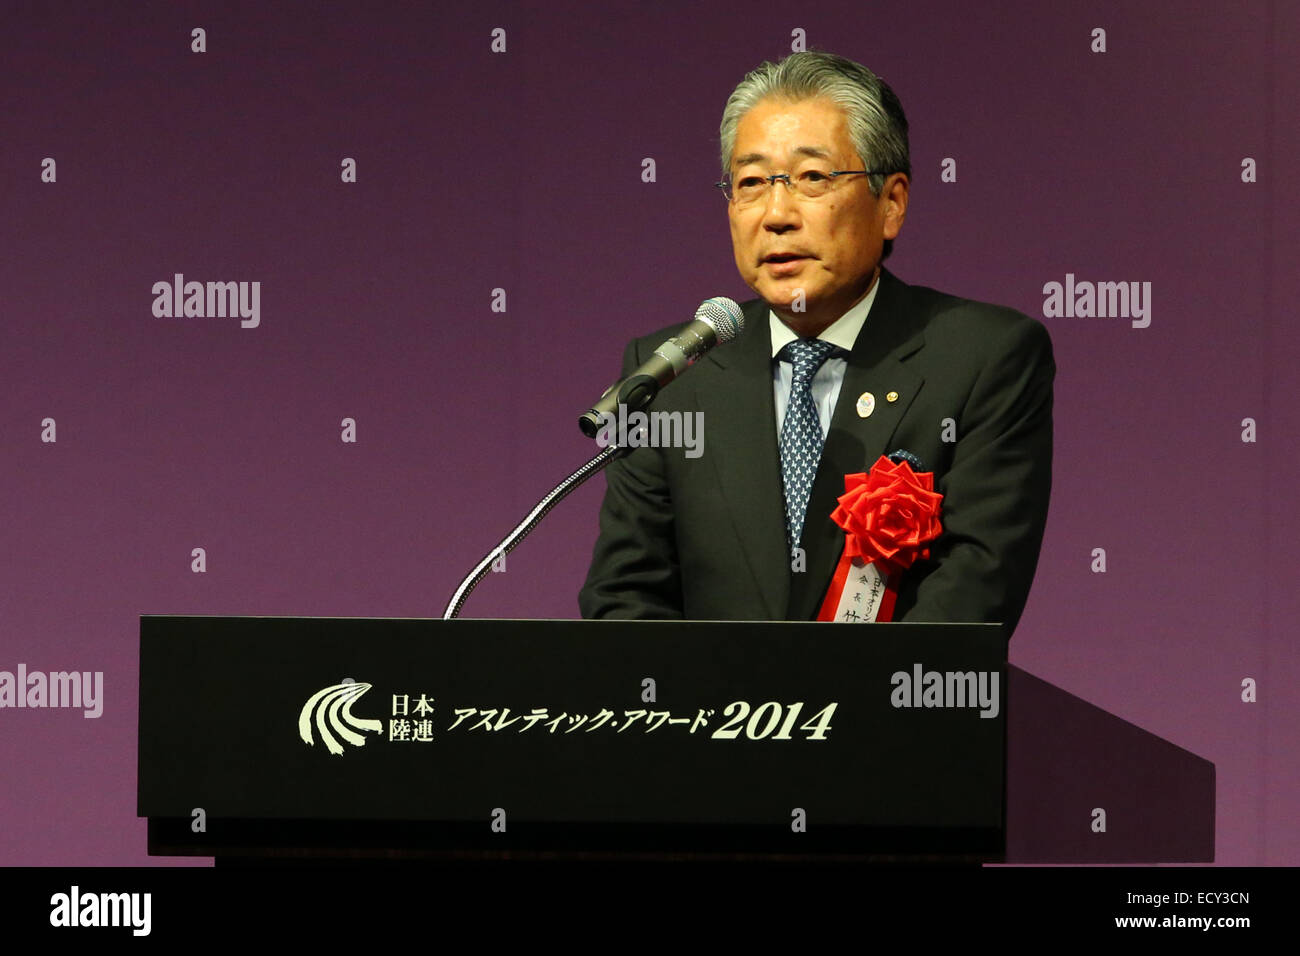 Tsunekazu Takeda, DECEMBER 22, 2014 - Athletic :  JAAF Athletic Award 2014 is held at the prince park tower tokyo, - Stock Image